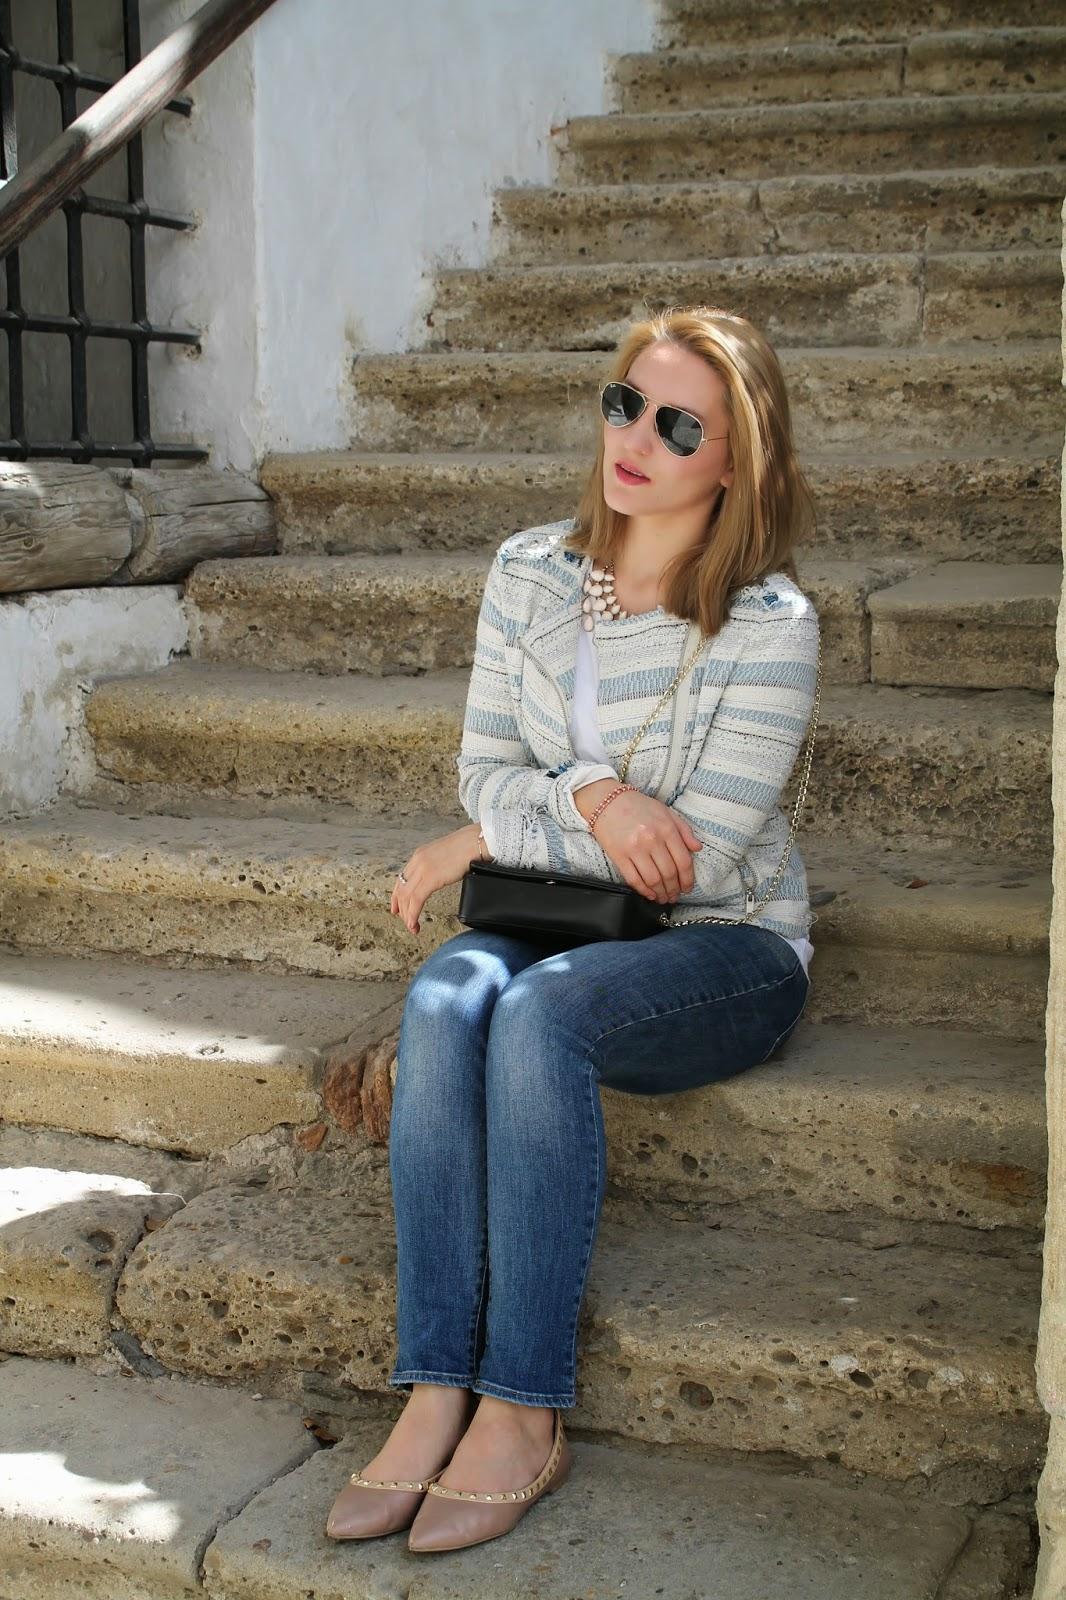 Fashionblogger / Fashionblogger Austria / Österreich / German / Deutsch / English / Kärnten / Carinthia / Köttmannsdorf / Blogger / Bloggerstyle / Streetstyle / Fashion / Look / Spring / Elegant / Hollenburg / Rosental / Jacket C&A Boucle / Ray Ban Aviator / Streetstyle / Mac / Levis Jeans / H&M Statement Necklace / Flats Valentino Forever 21 / Zara Bag /